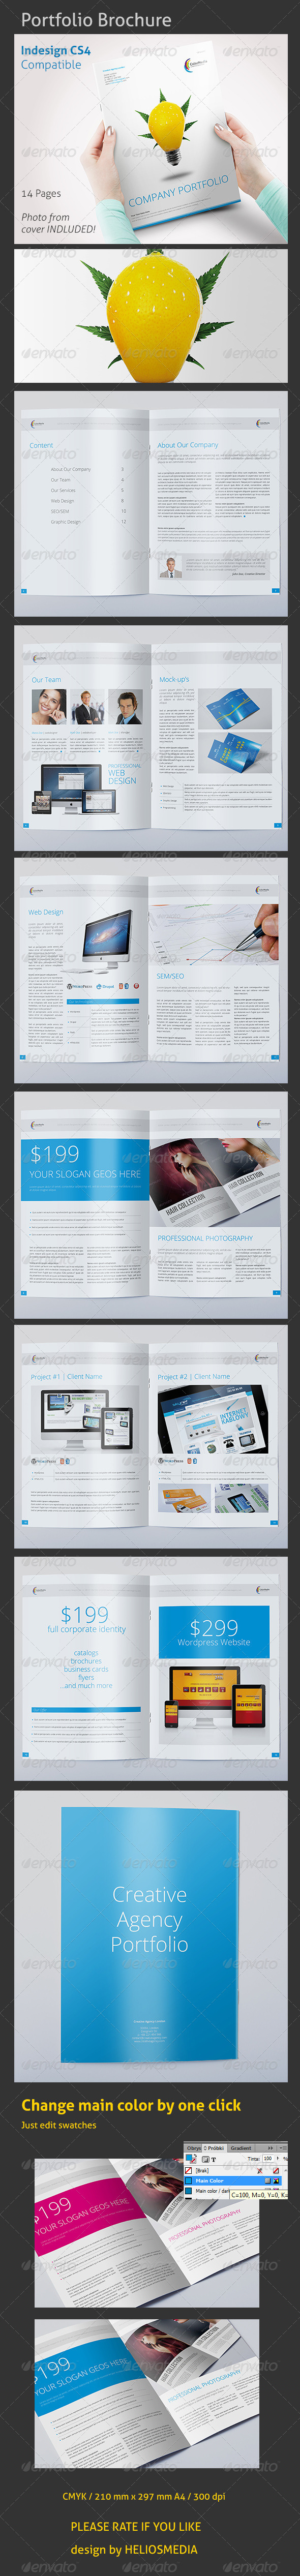 Creative Agency Portfolio - Portfolio Brochures